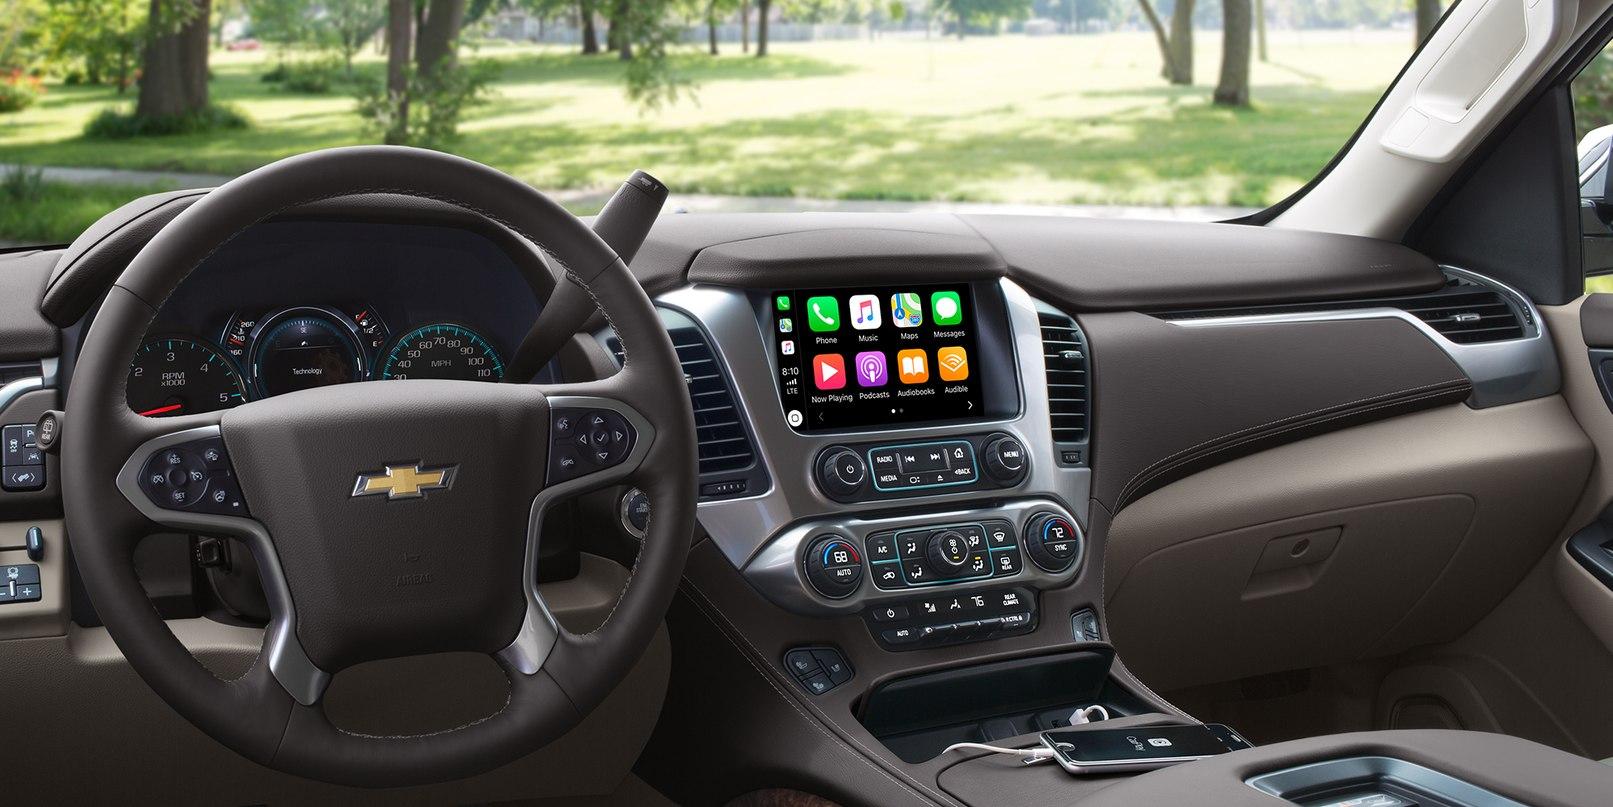 Interior of the 2019 Chevrolet Tahoe